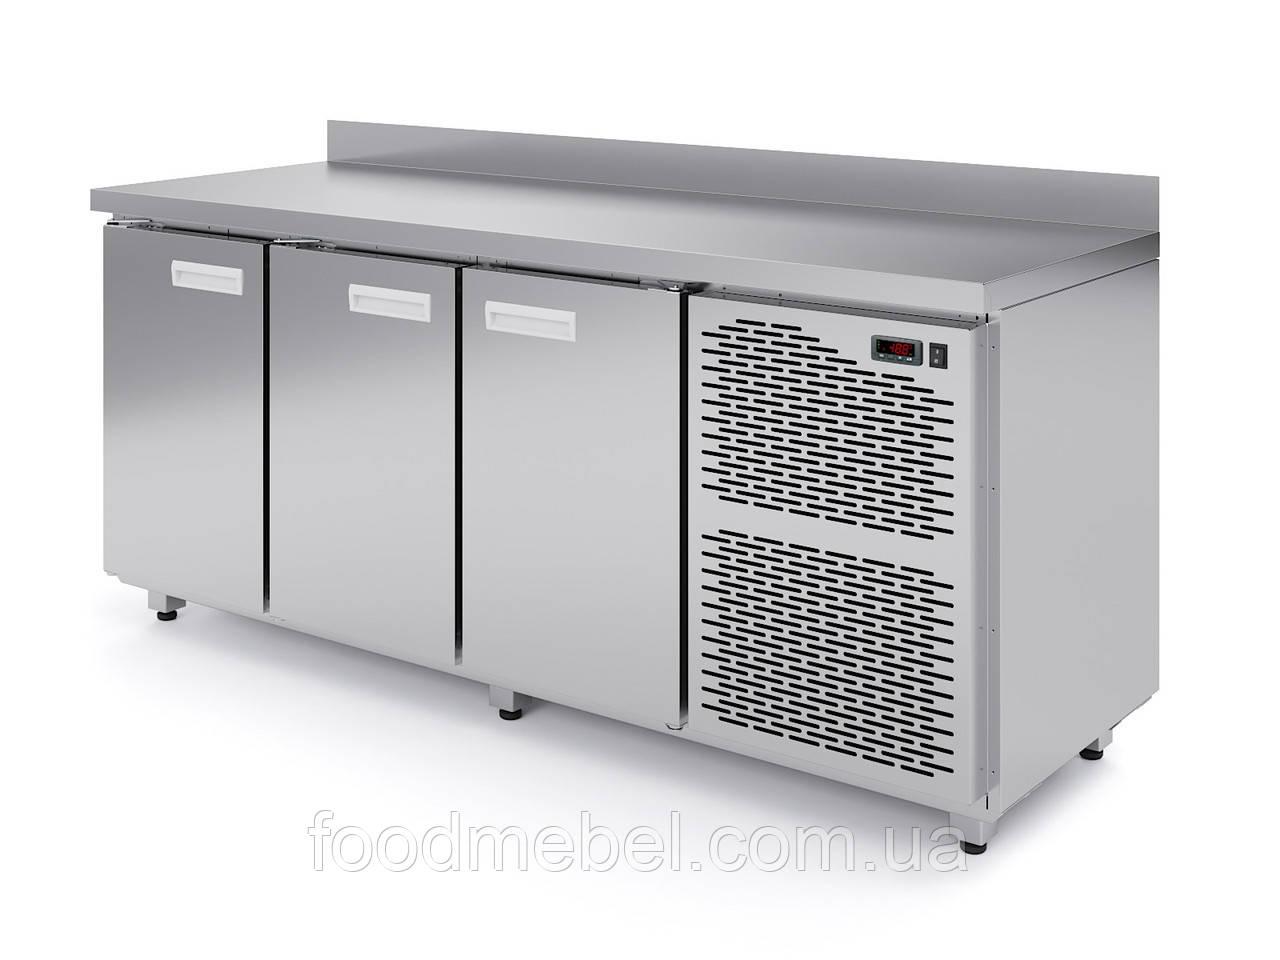 Морозильный стол СХН-3-70 (-18 С) трехдверный